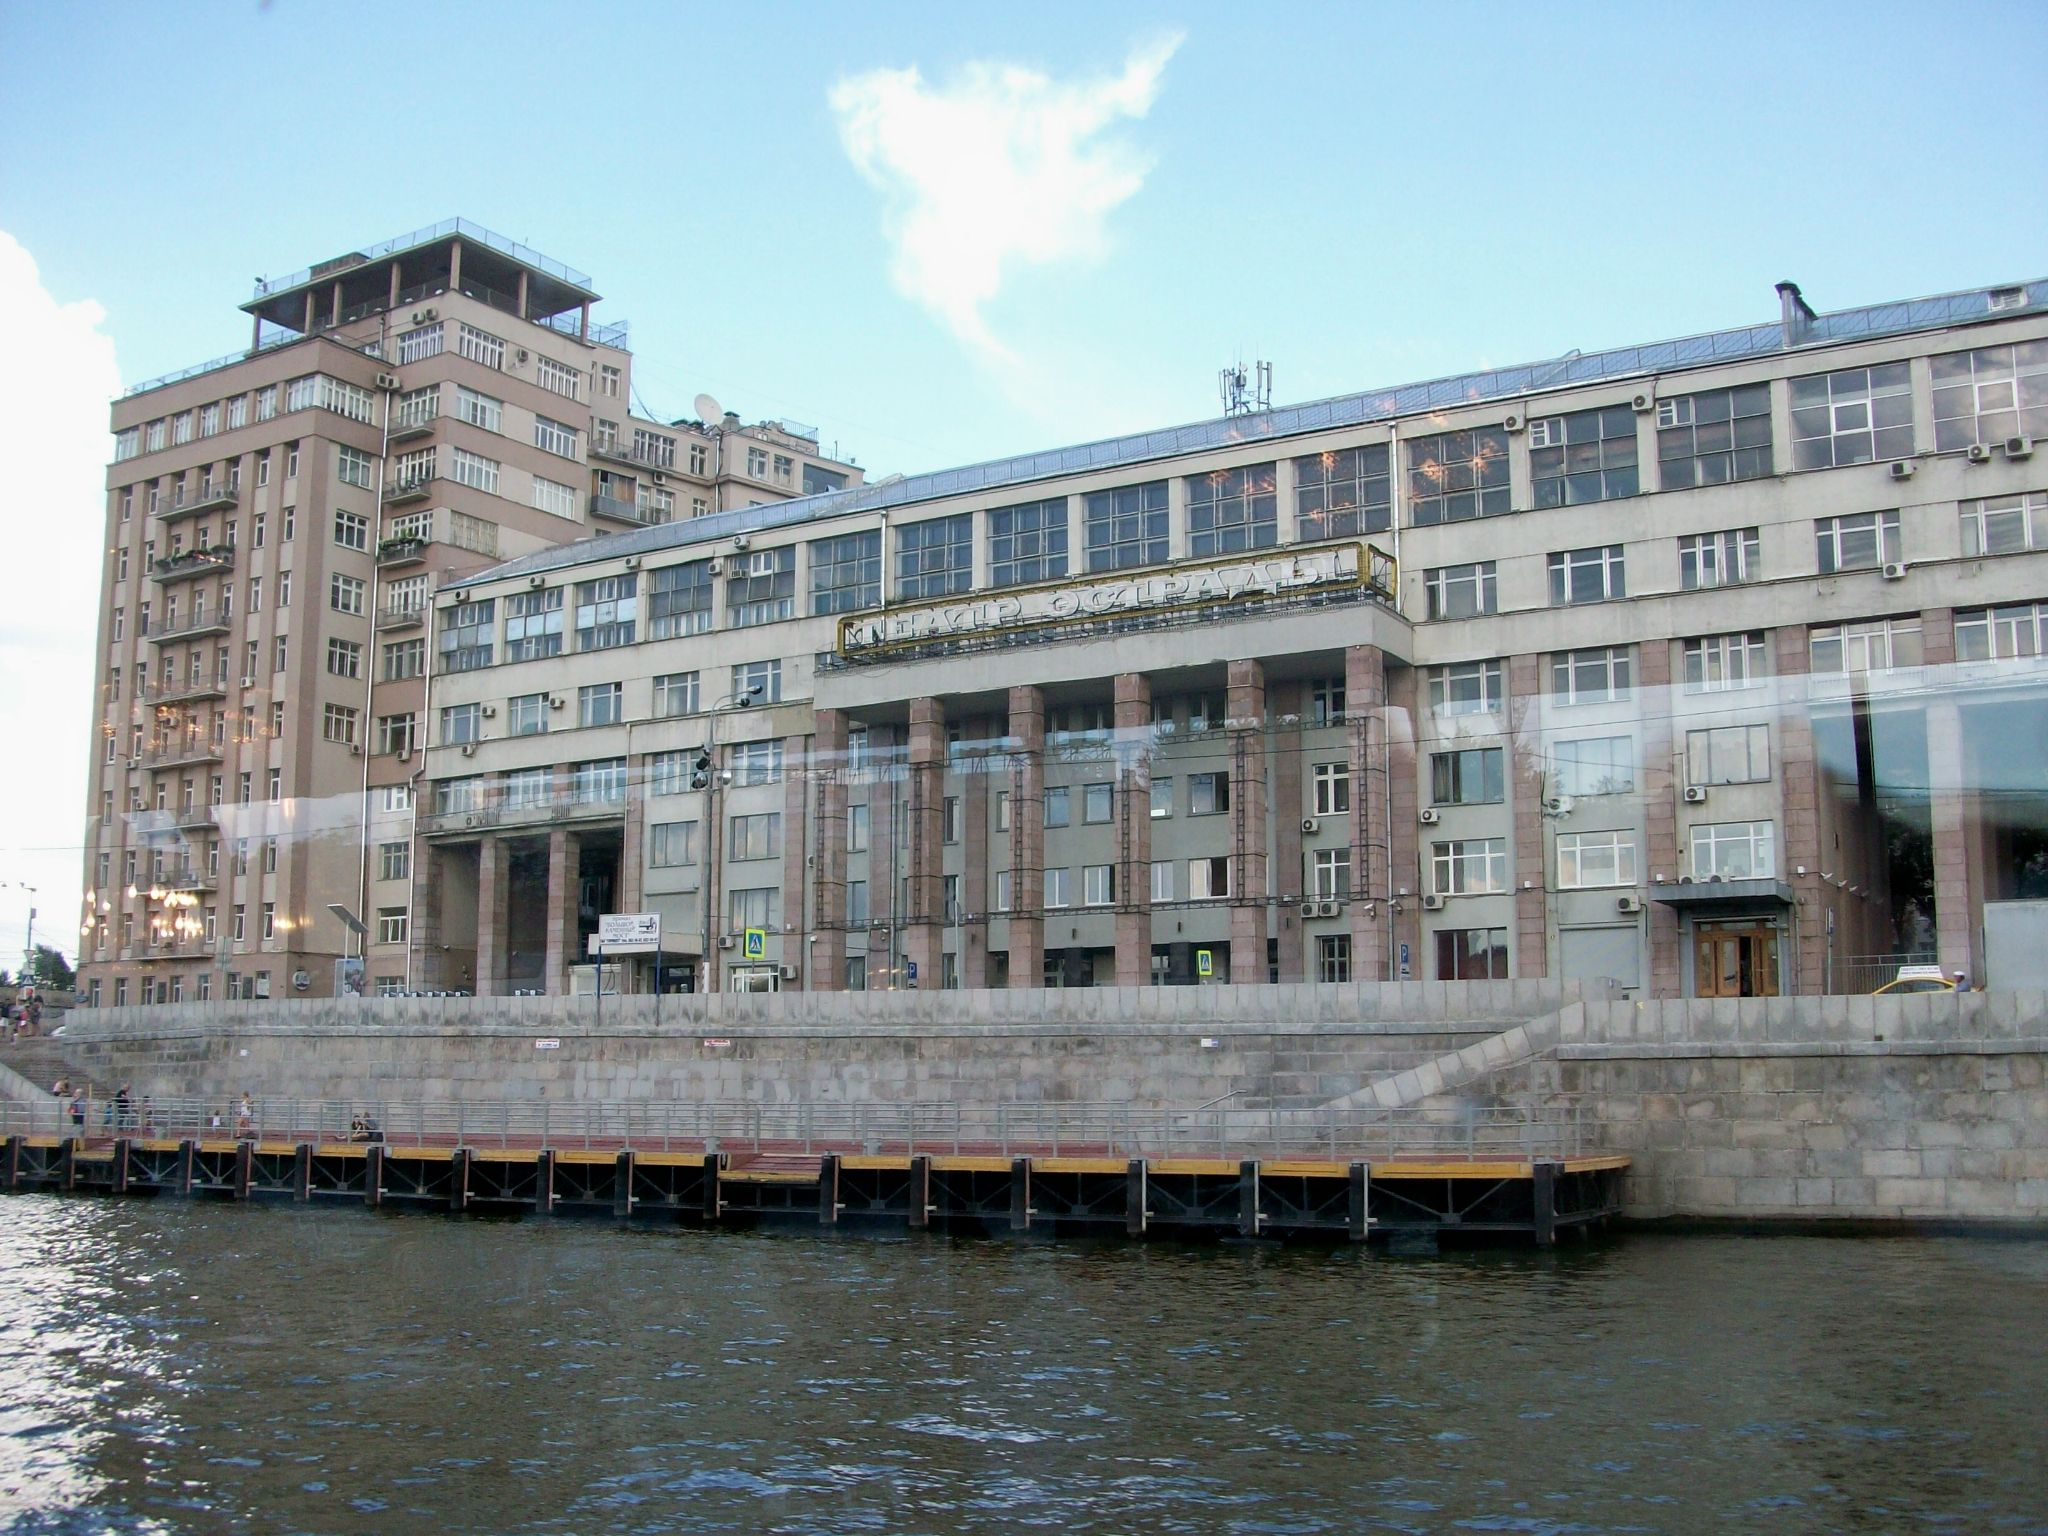 Moscow State Estrada Theatre on Bersenevskaya embankment by NatalyaParris